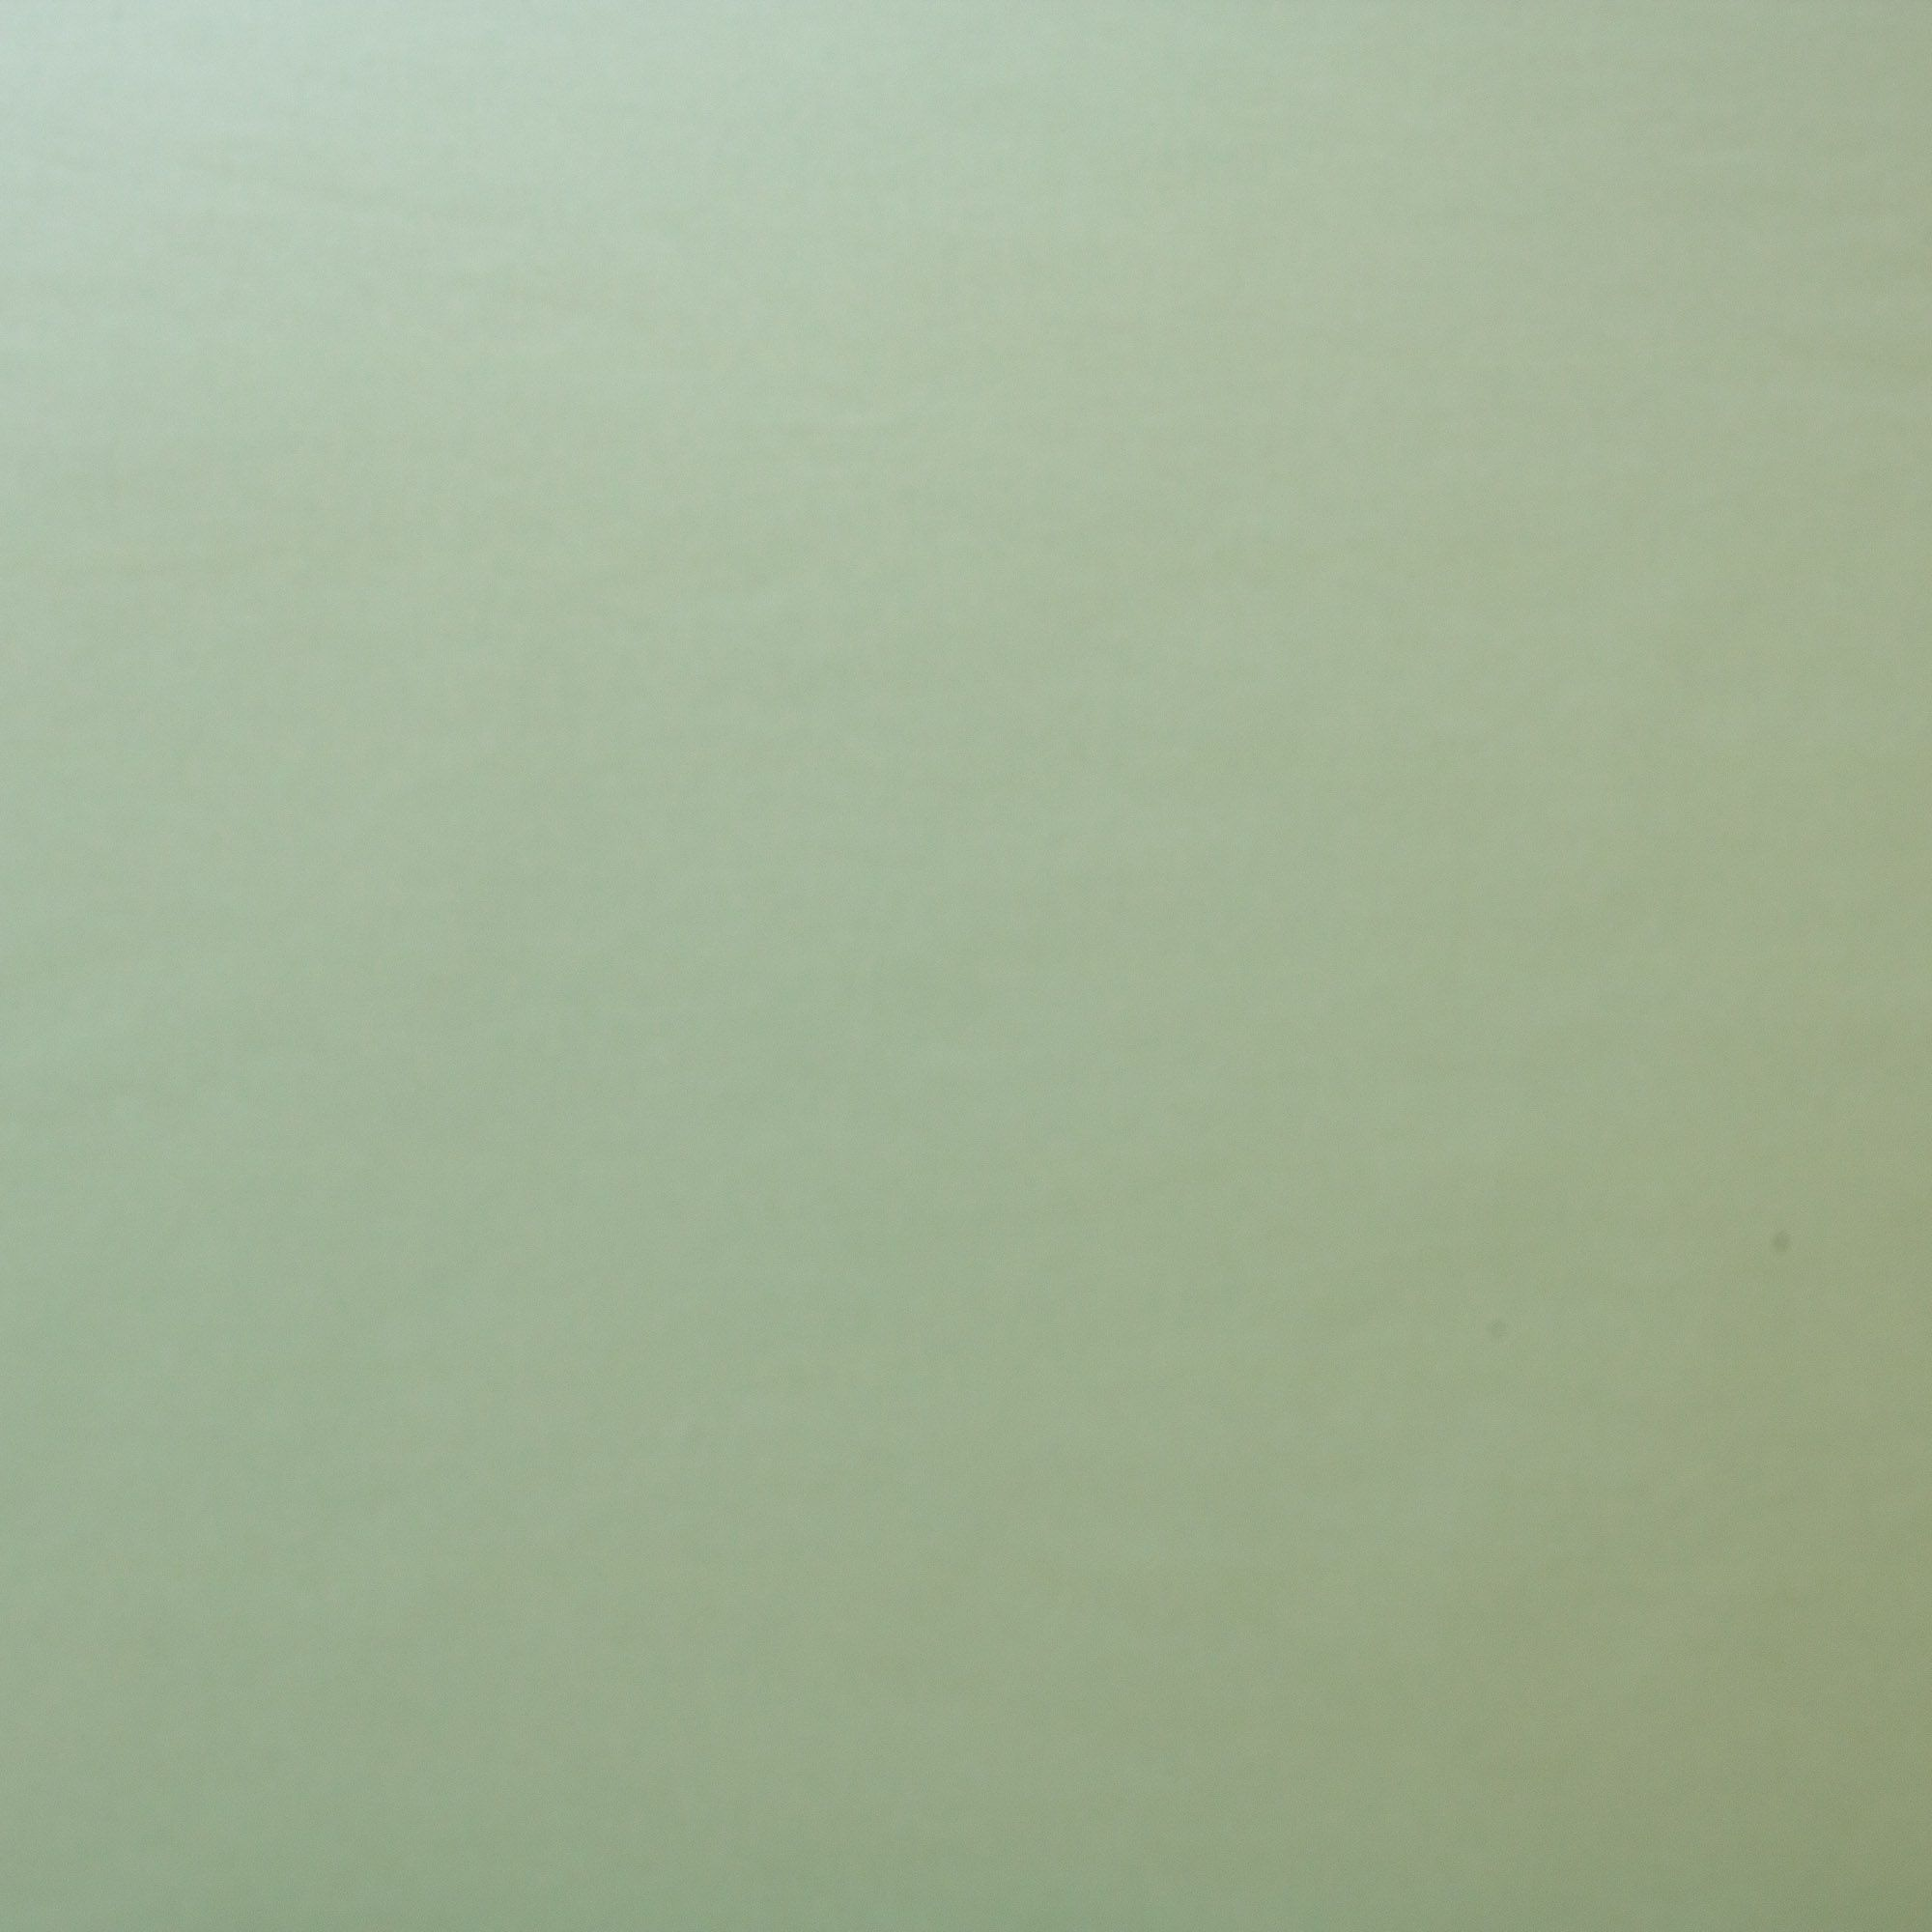 Tecido Malha Helanca Light Verde Agua 100% Poliester 1,80 mt Largura